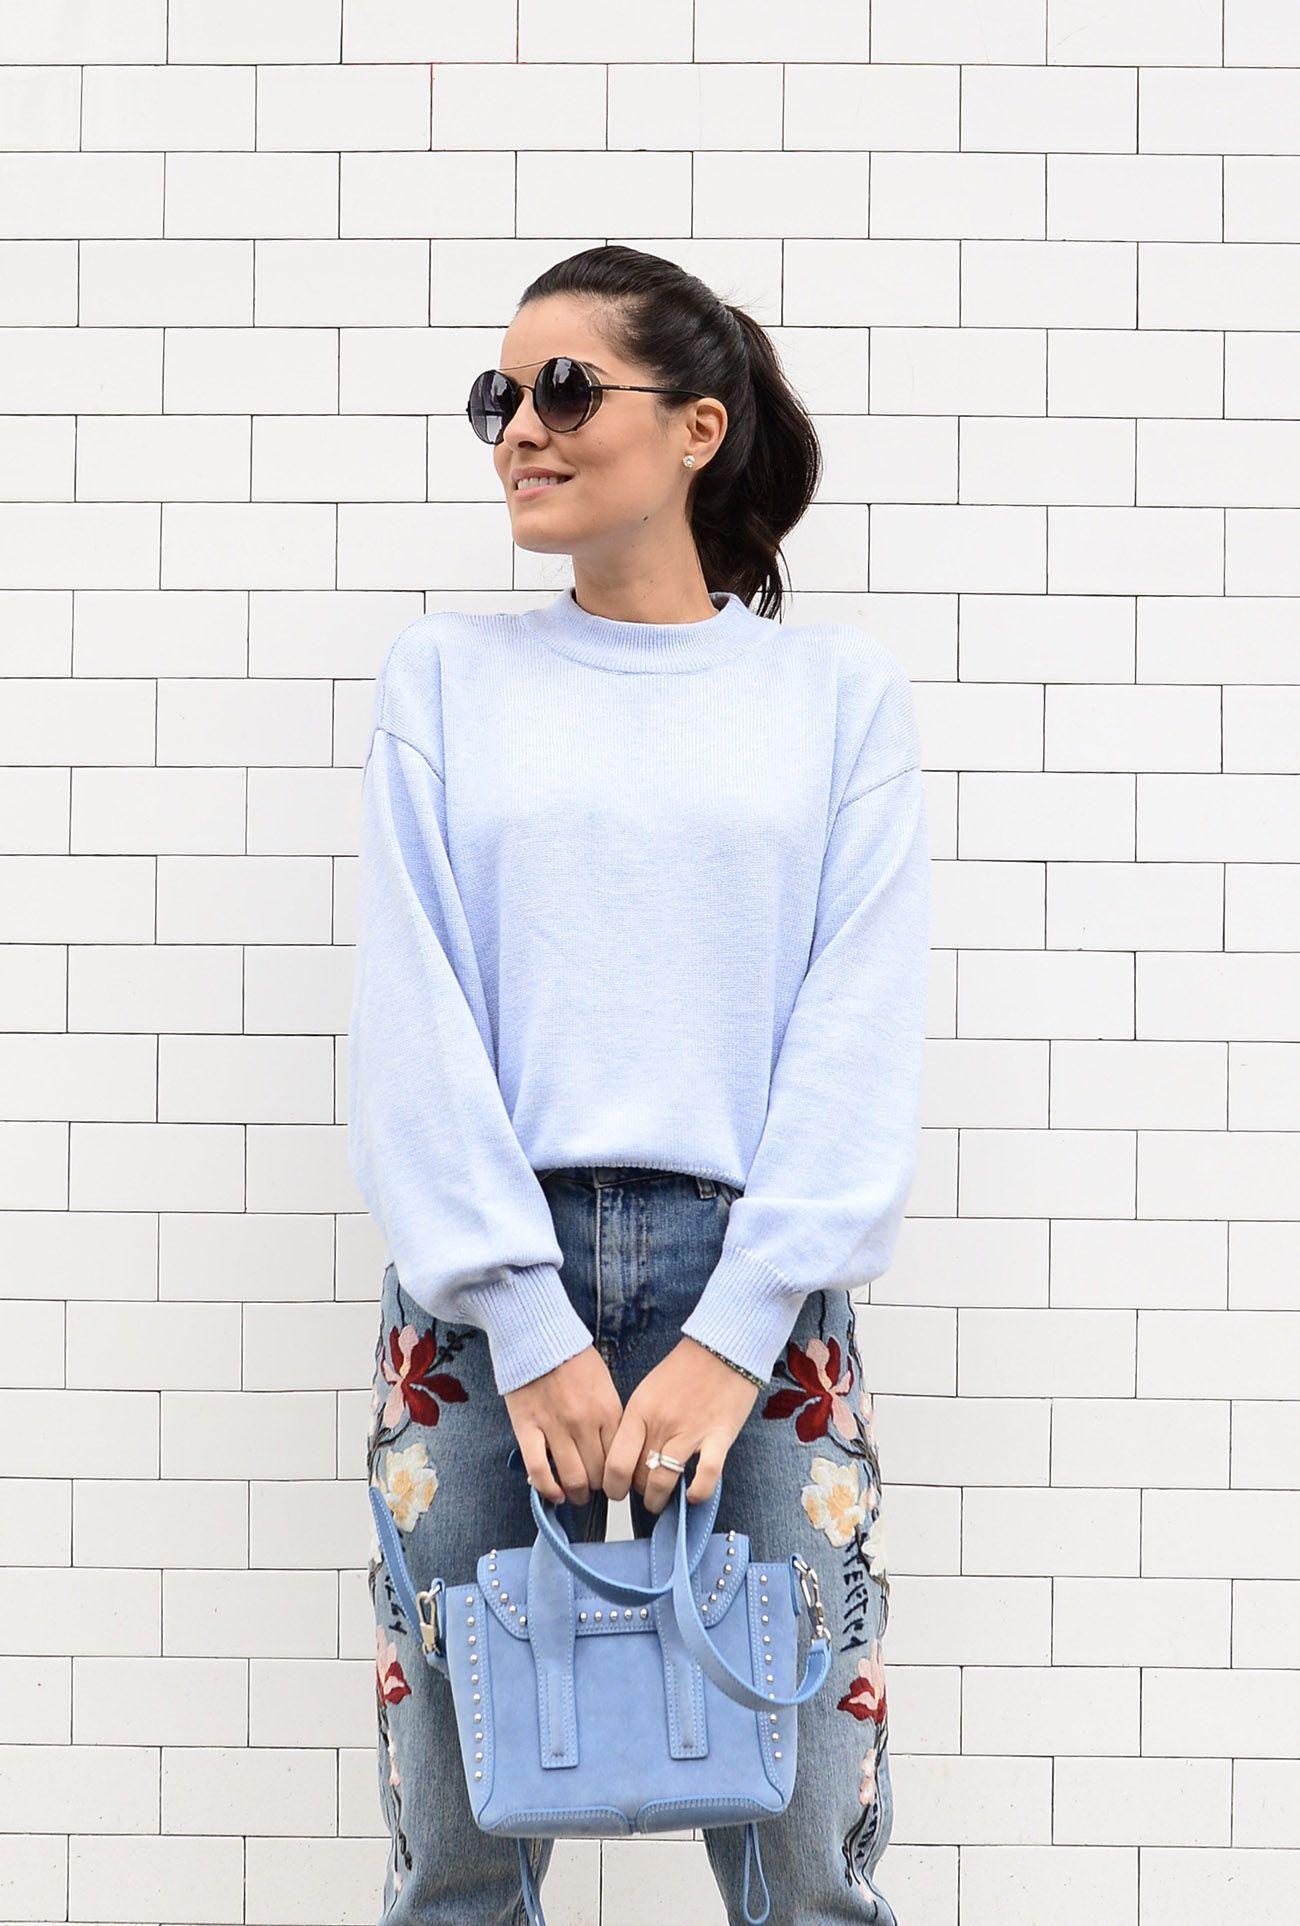 BlogdaMariah NYFW looks16